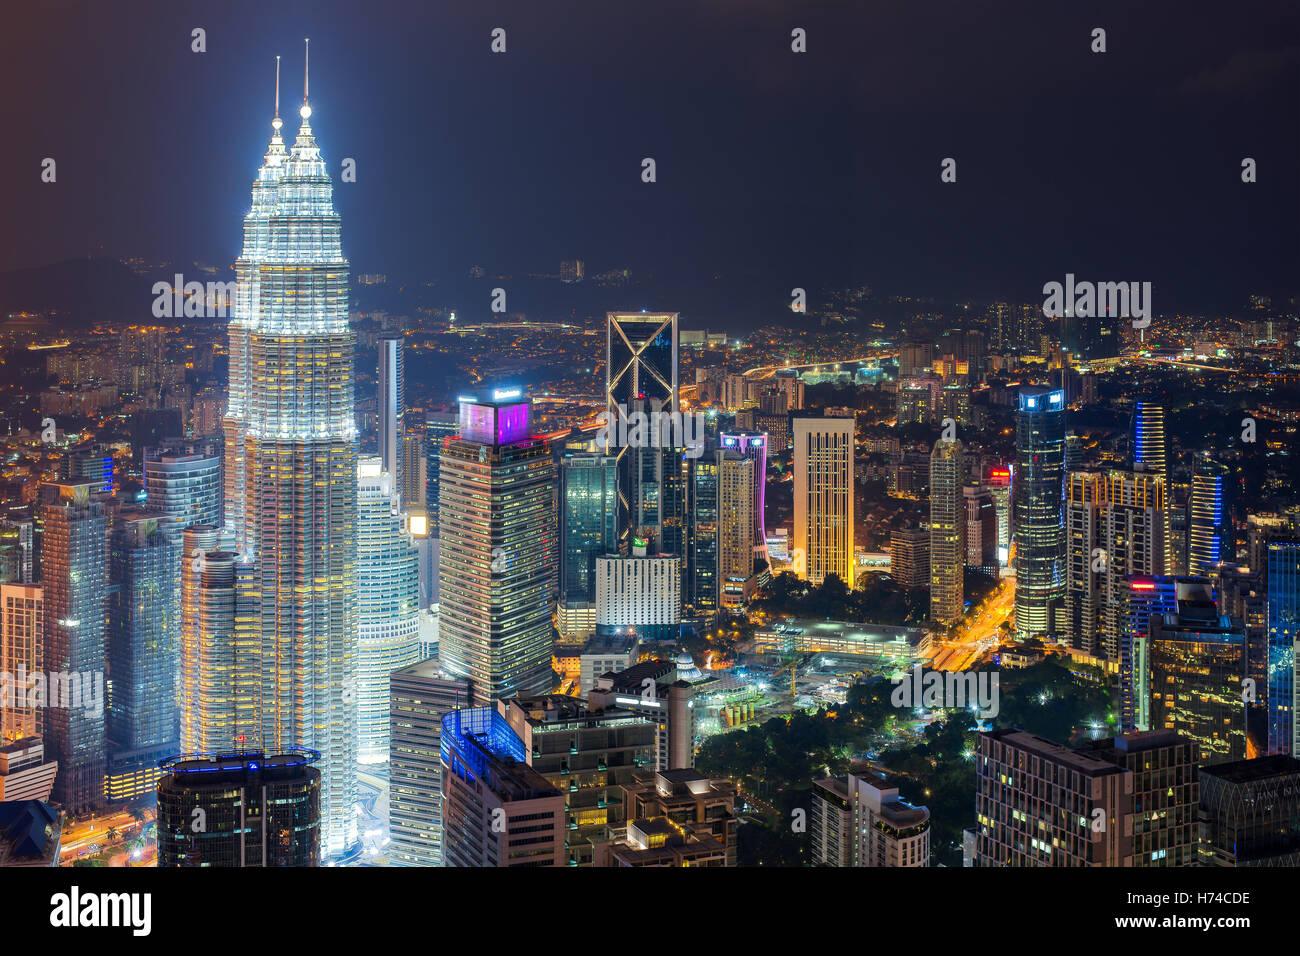 Horizonte de Kuala Lumpur y rascacielos en la noche en Kuala Lumpur, Malasia. Imagen De Stock